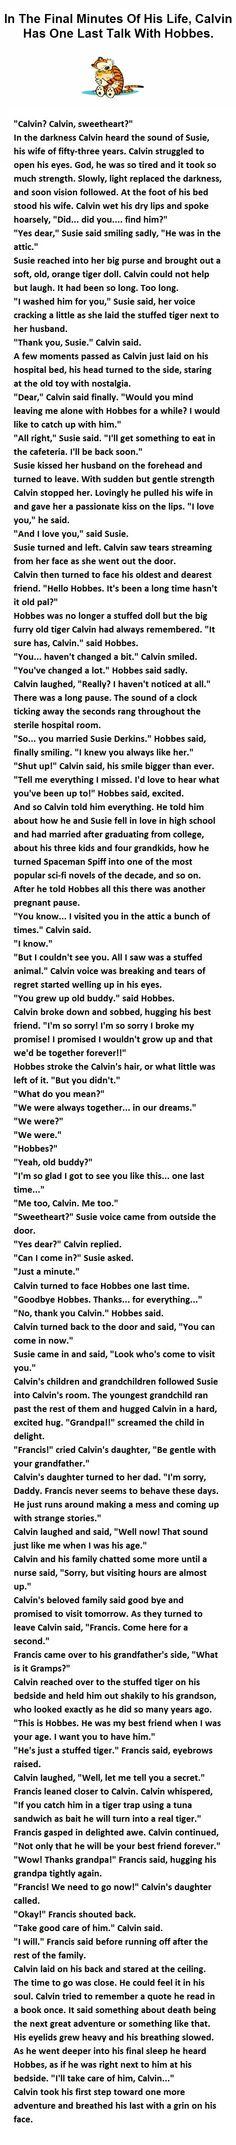 "Calvin says ""Bye"" to Hobbes"